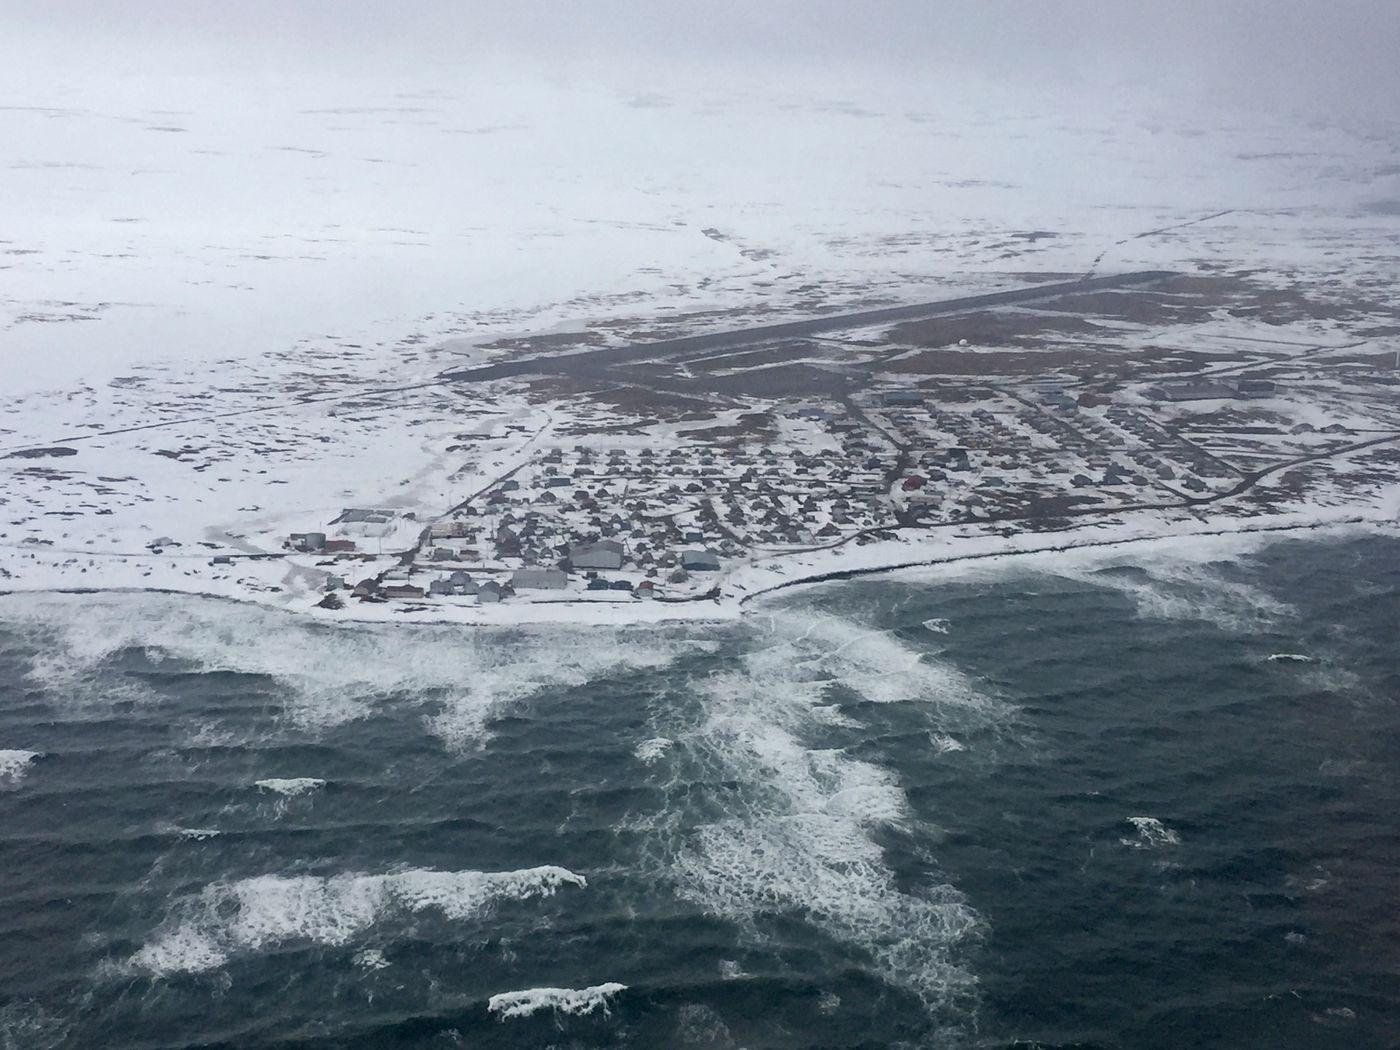 Waves break near the shore in Savoonga inApril. (Marc Lester / Alaska Dispatch News)